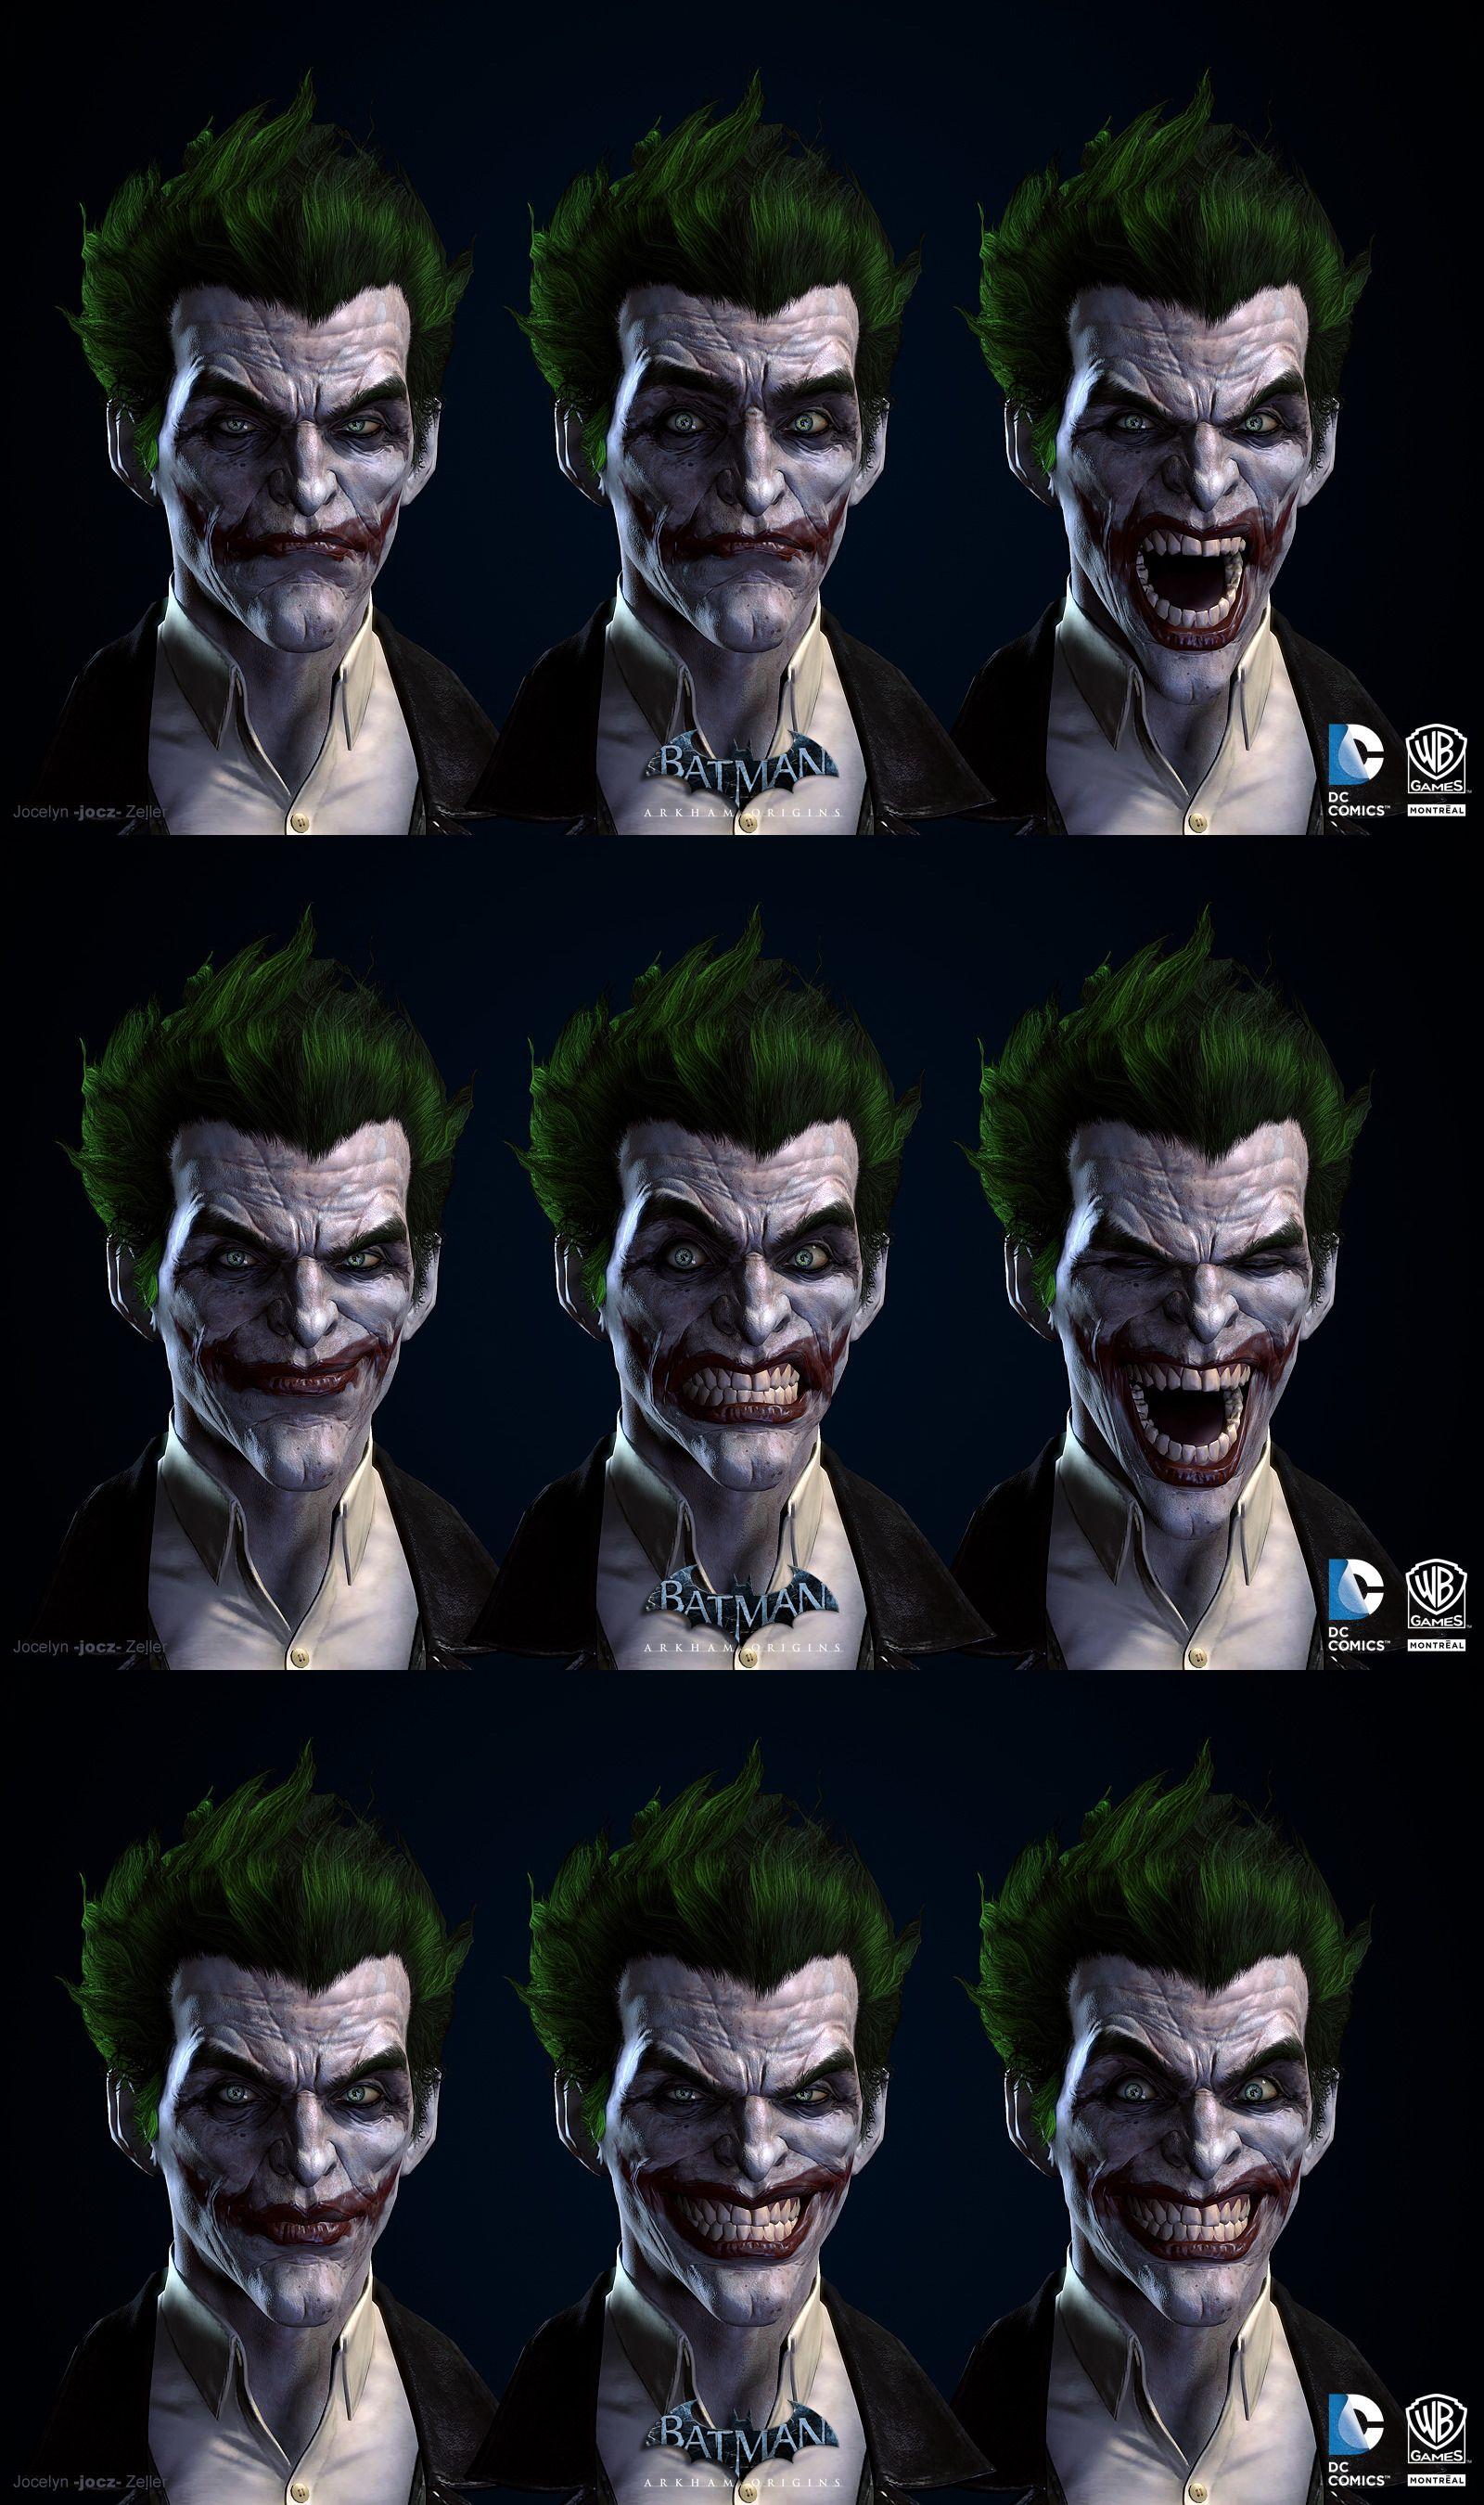 Batman arkham origins joker blendshapes by jocz 3d stills batman arkham origins joker blendshapes by jocz voltagebd Images